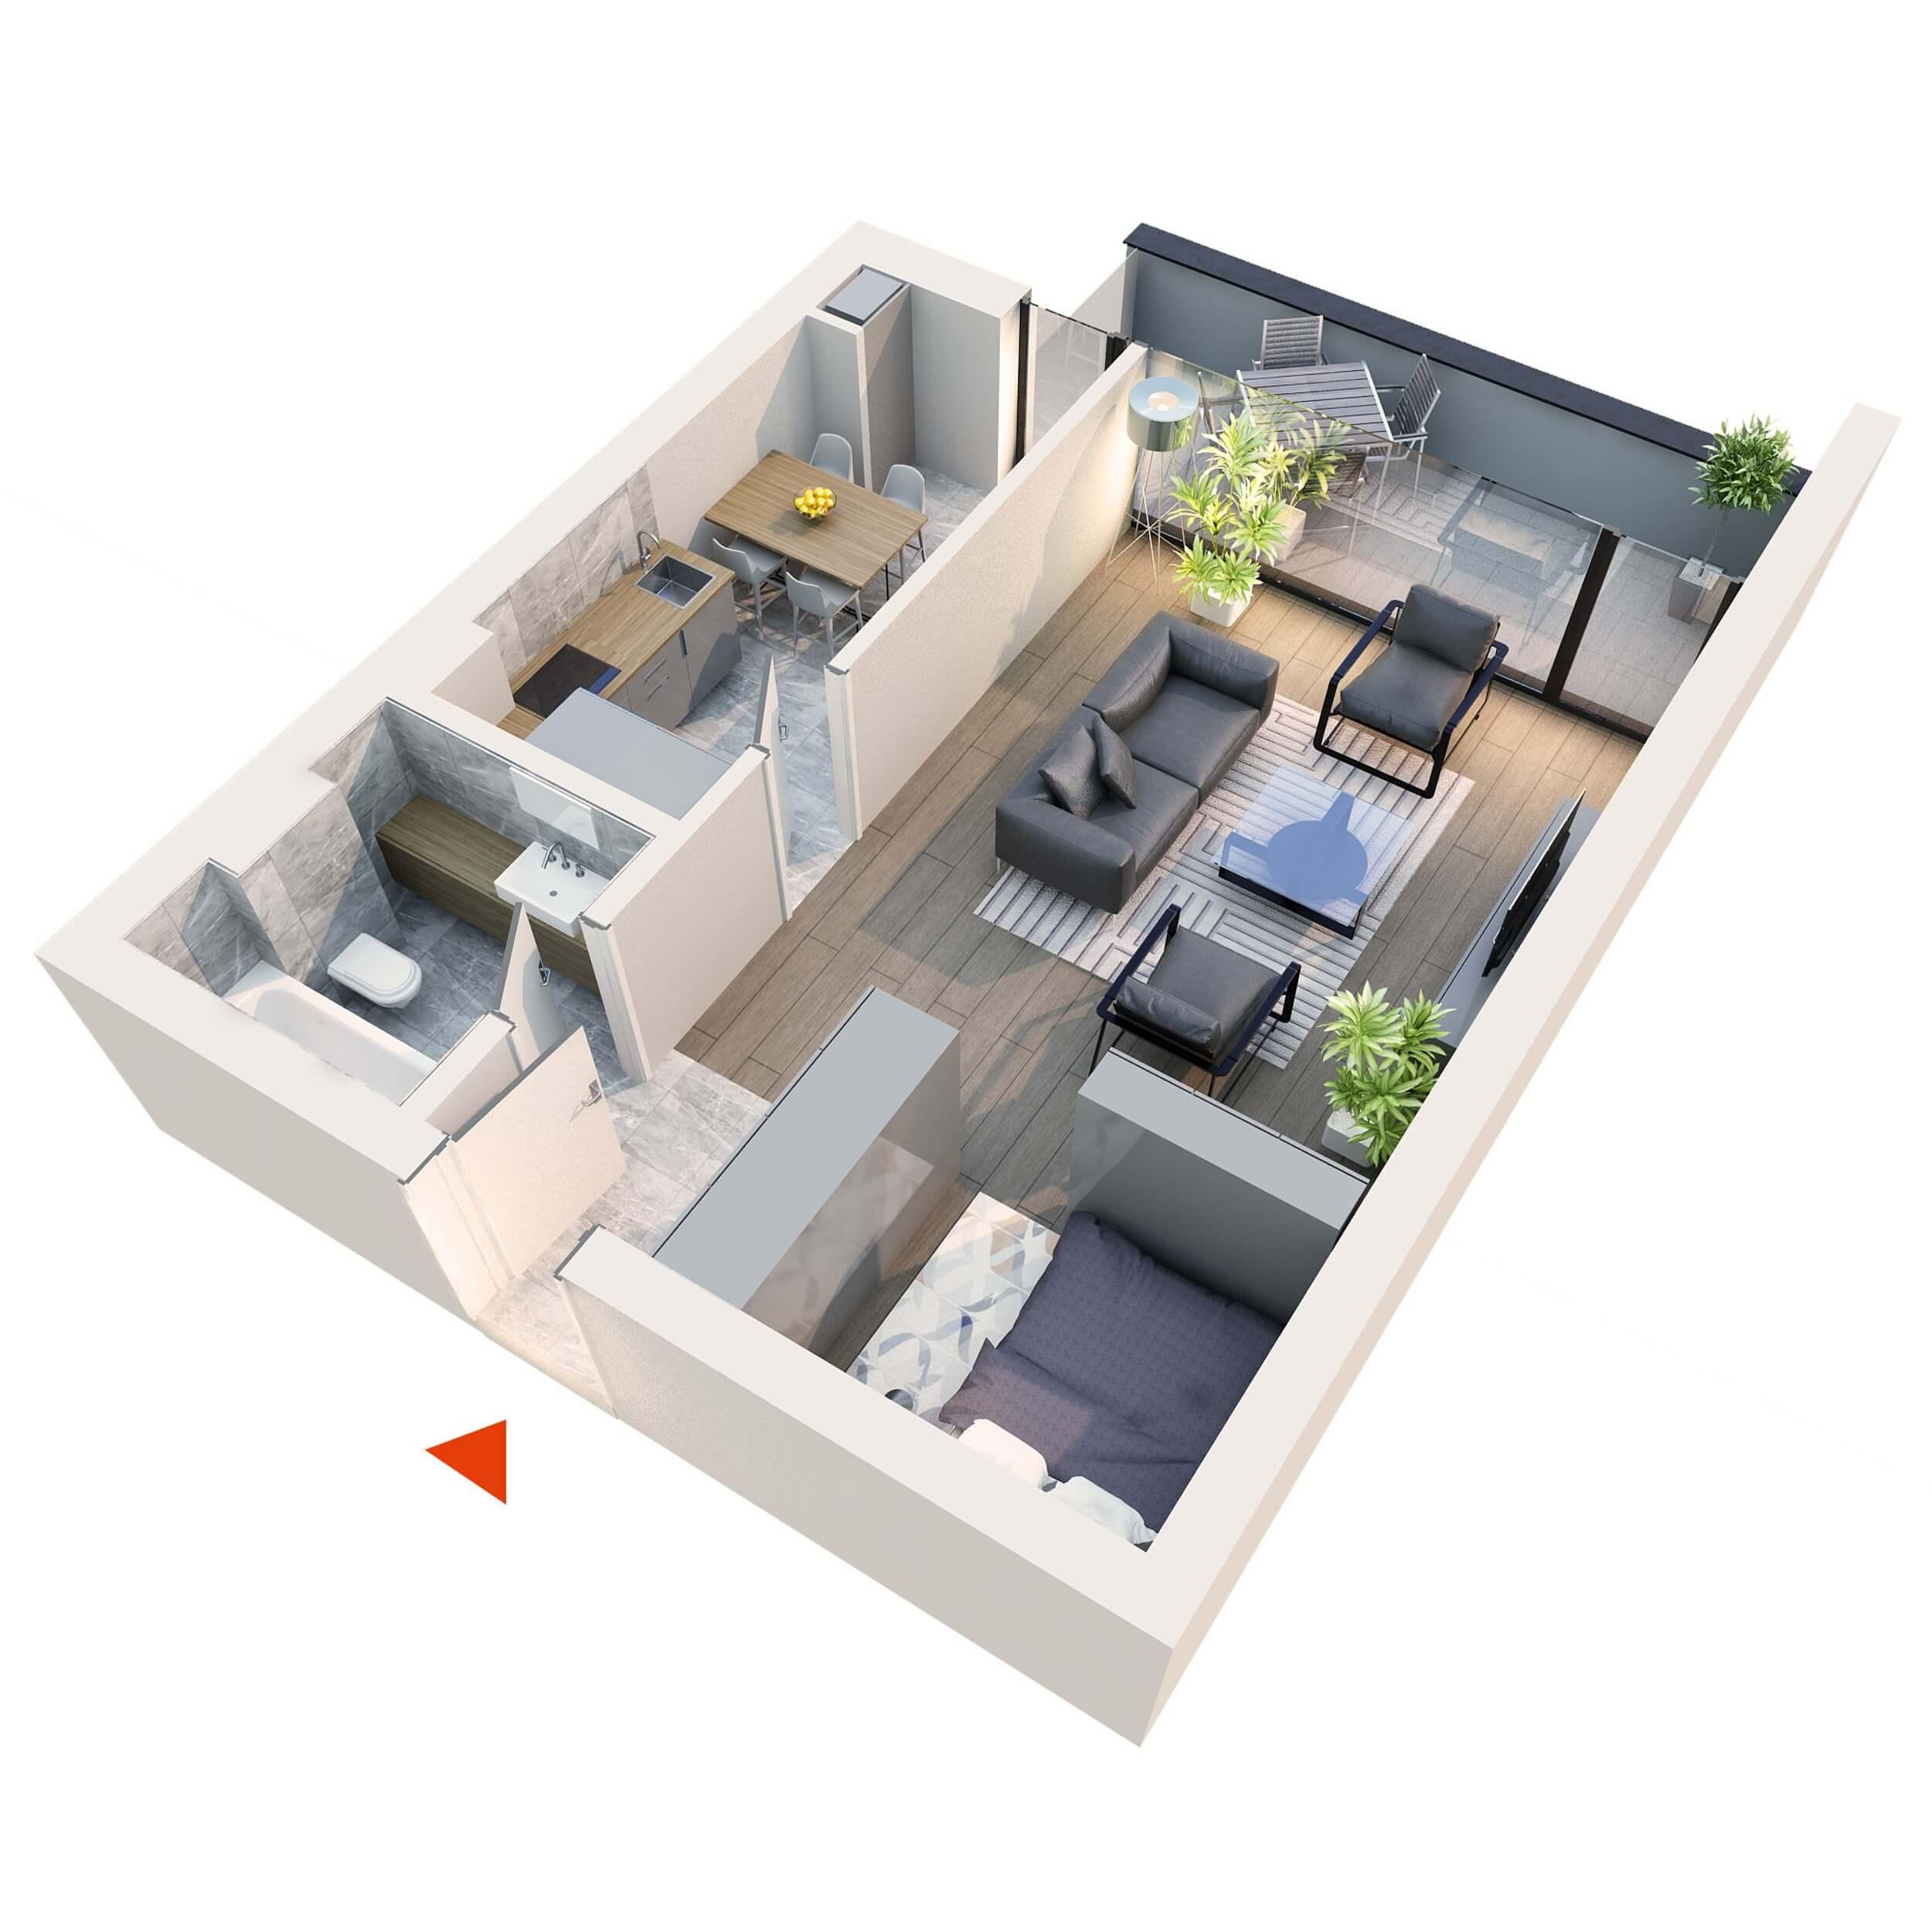 Apartament Studio tip 1D1 | Balcon | Etaj 1 – 5 | Corp C7 | Faza 2